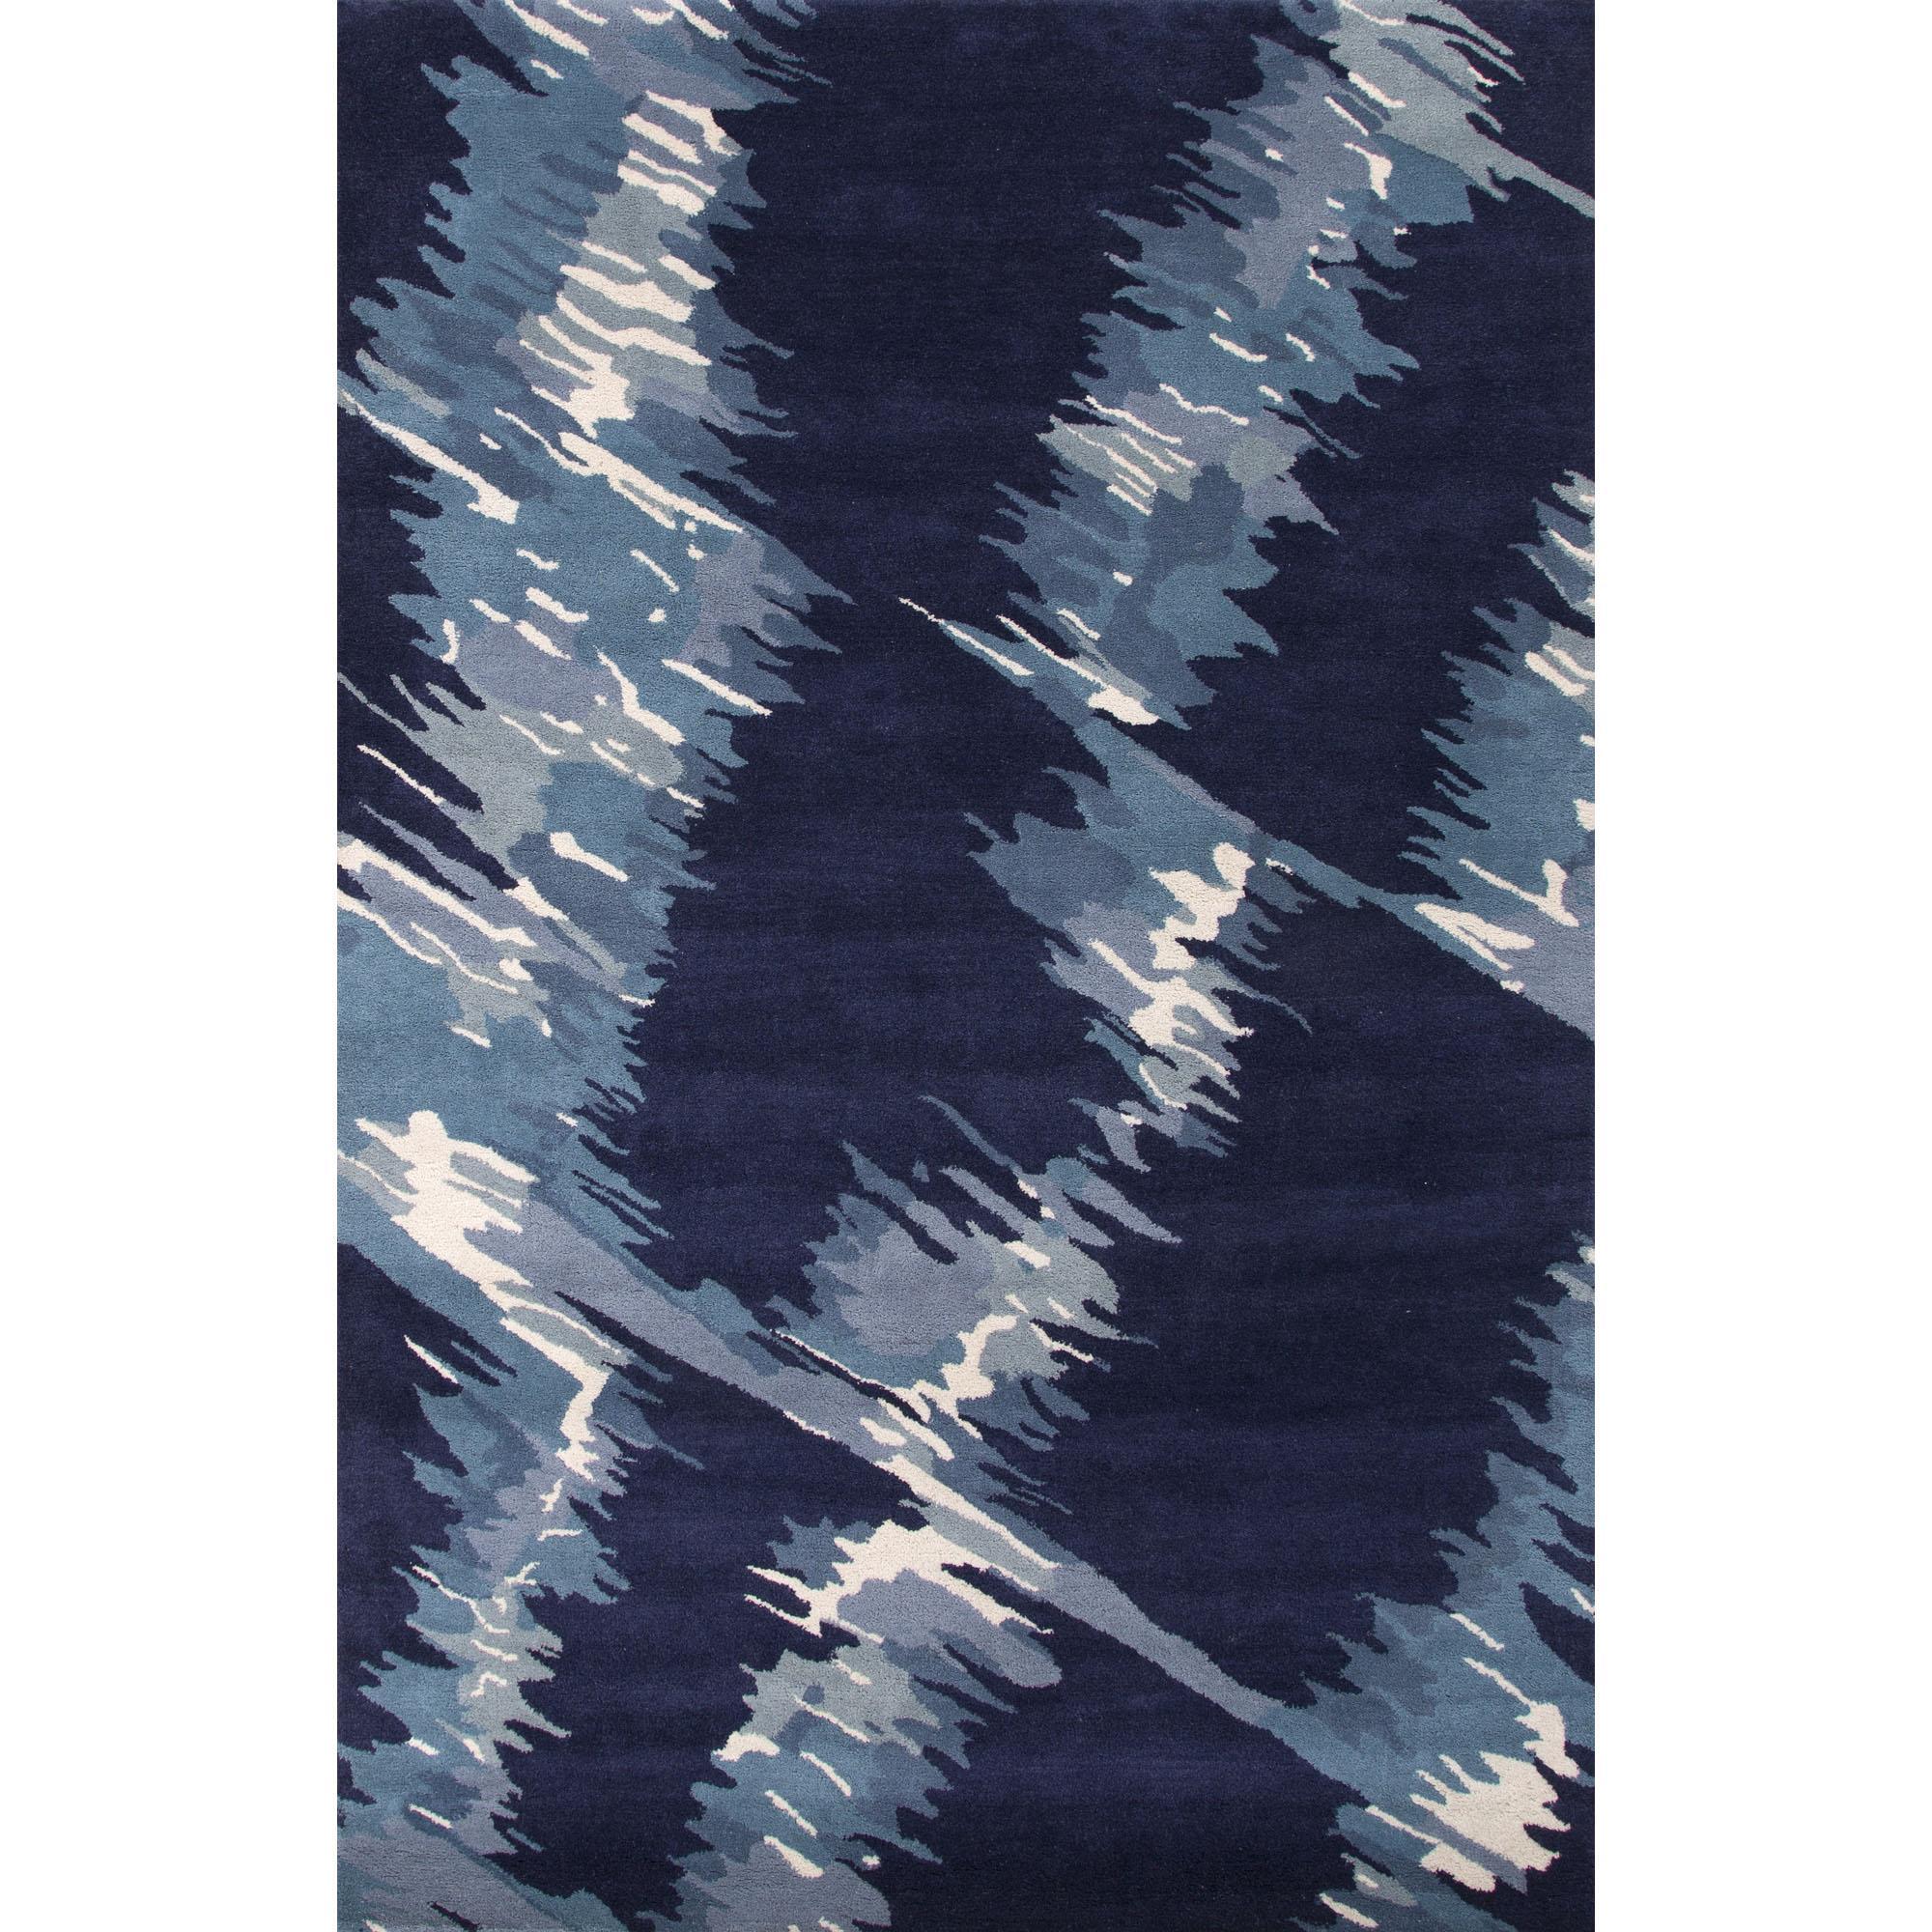 JAIPUR Rugs En Casa By Luli Sanchez Tufted 5 x 8 Rug - Item Number: RUG115633